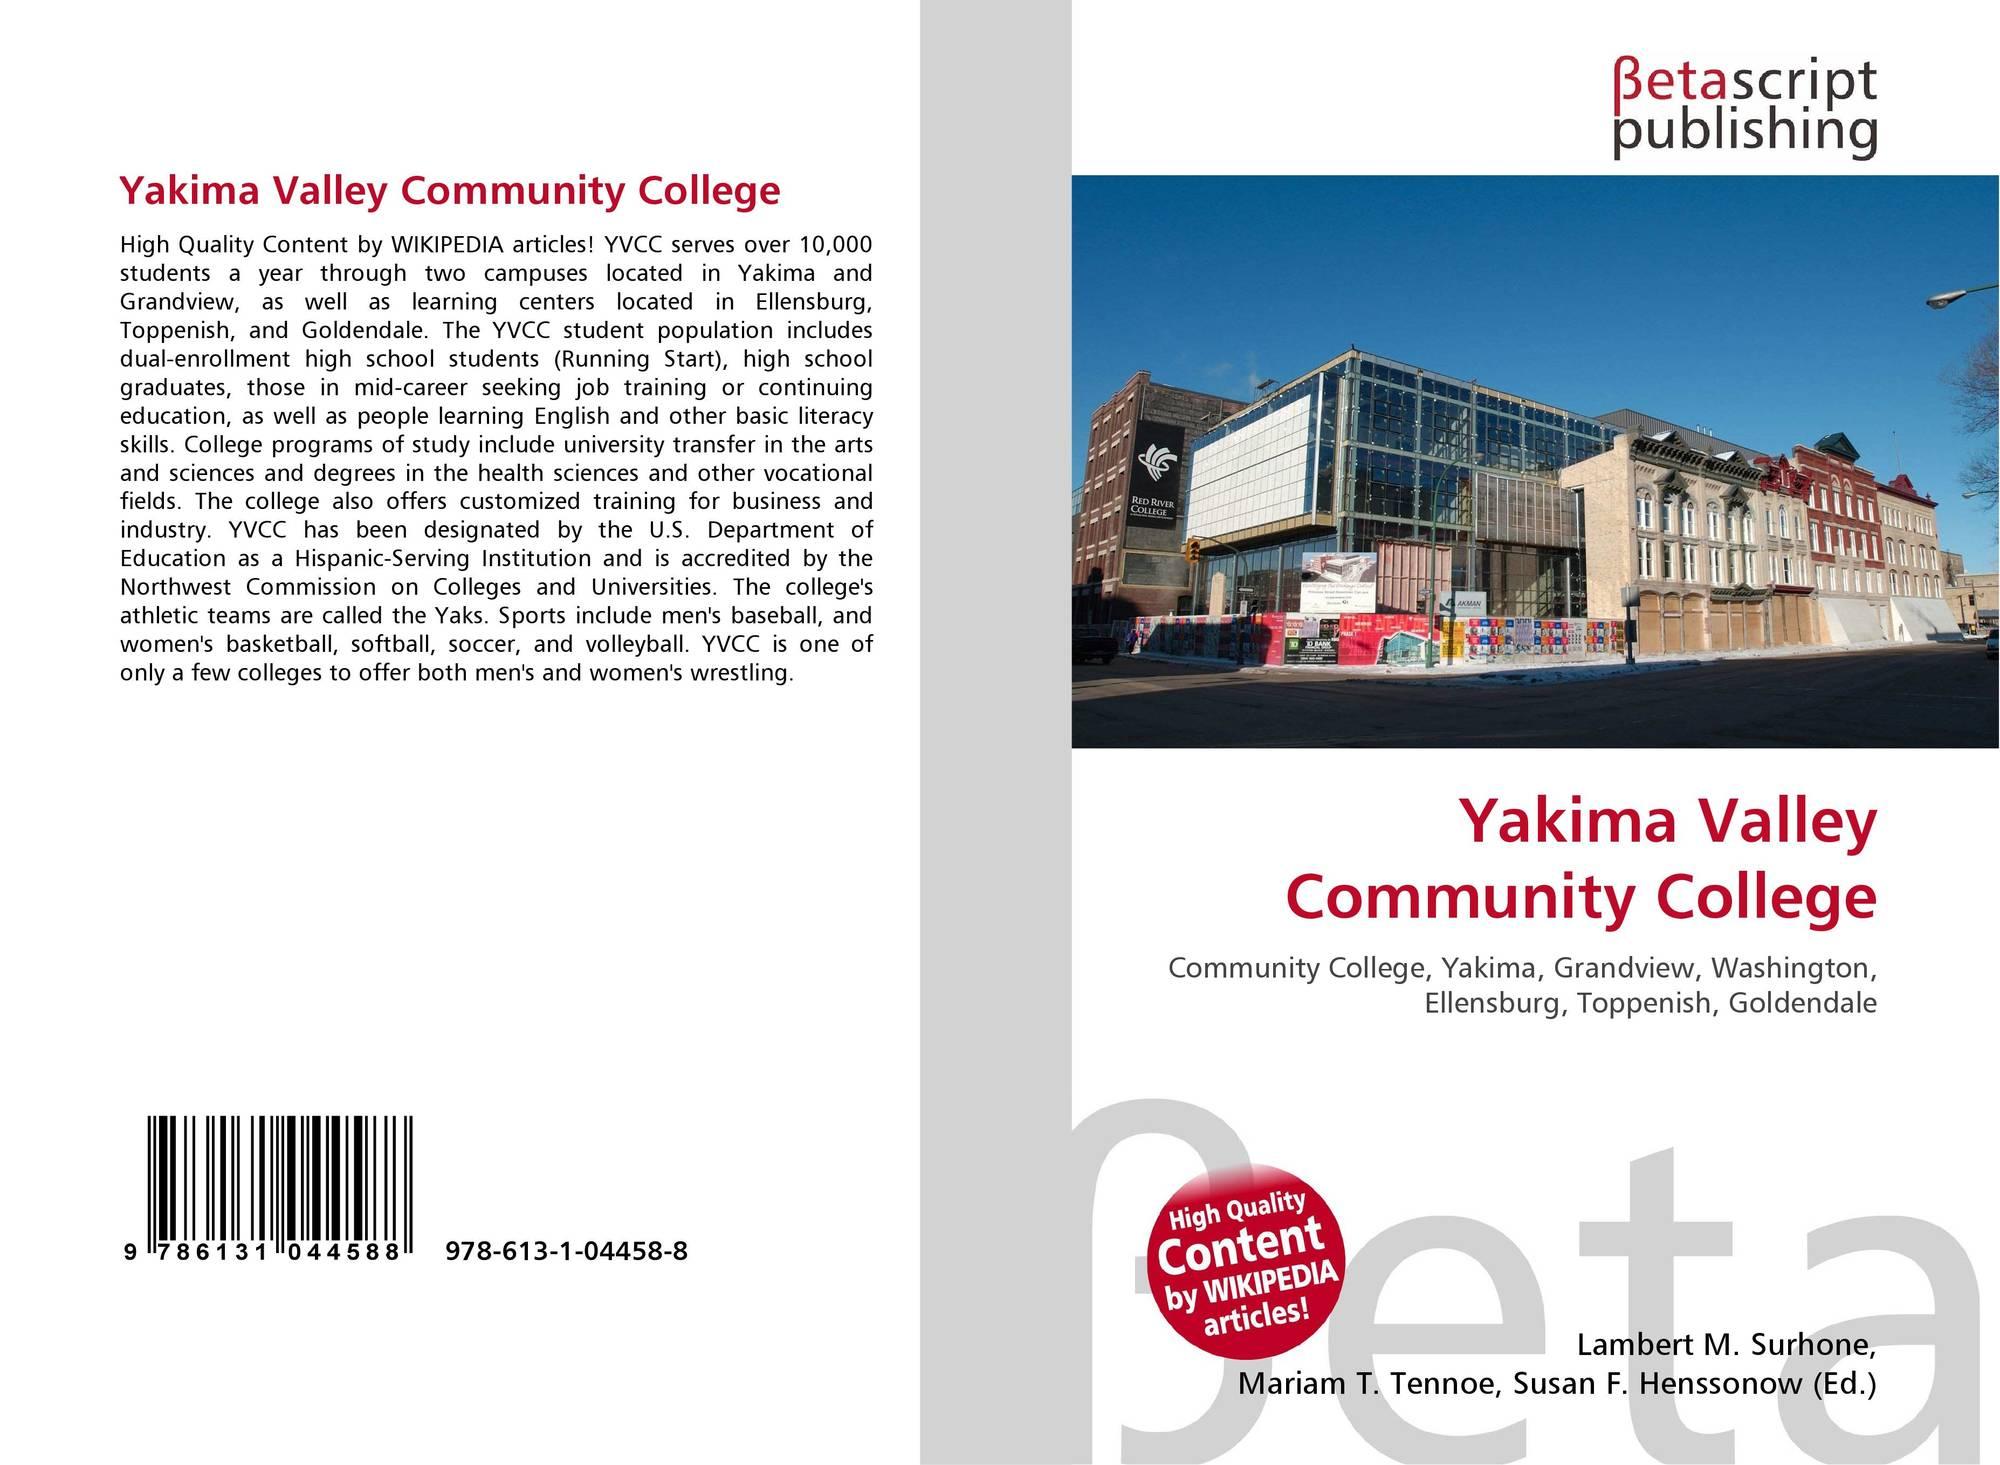 Yakima Valley Community College 978 613 1 04458 8 6131044589